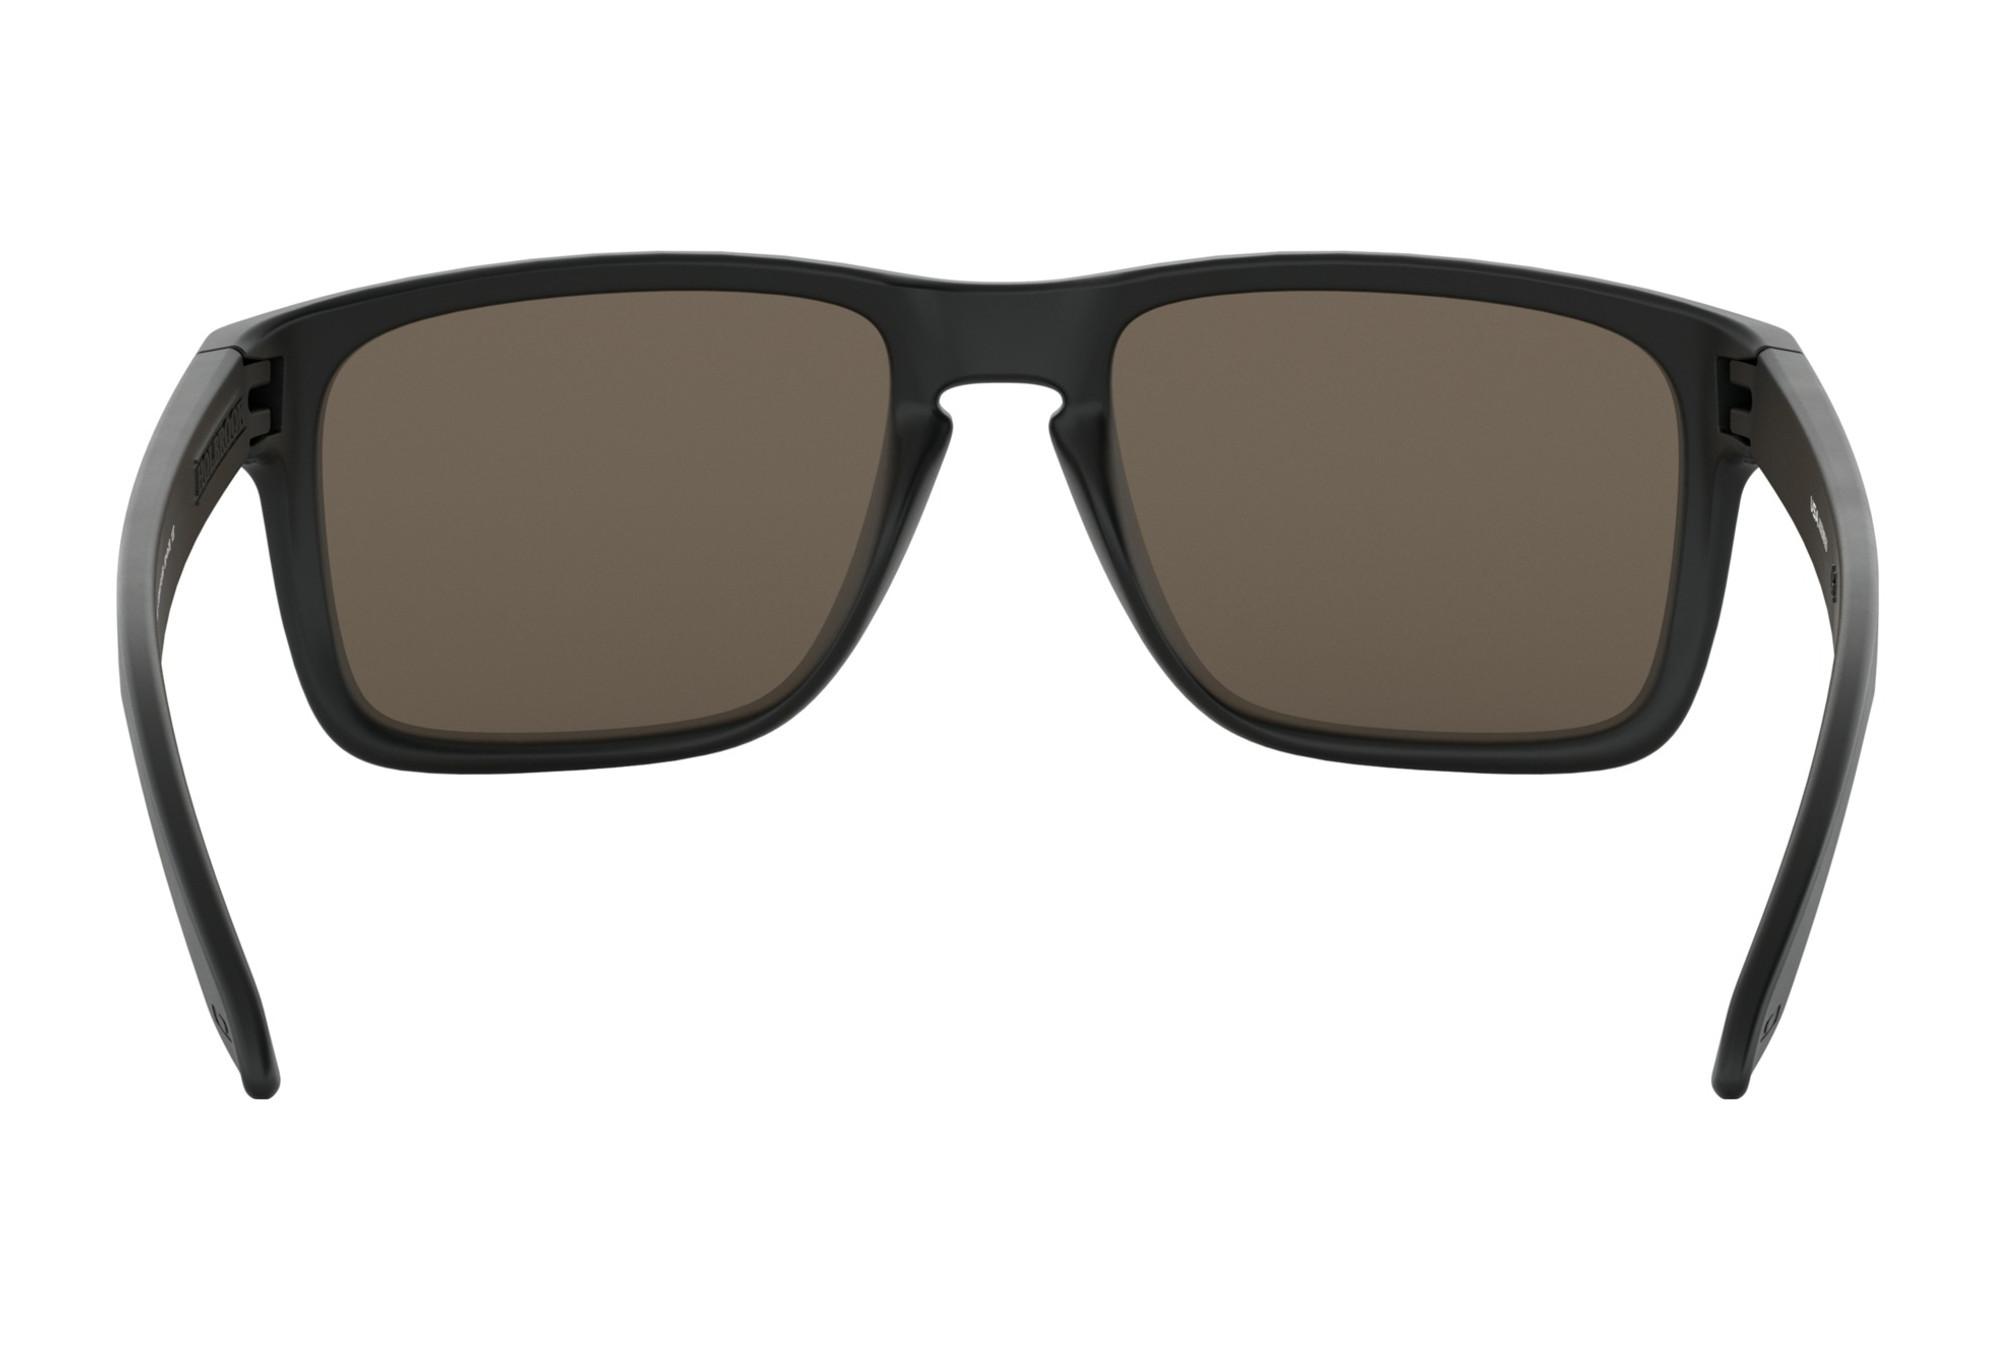 1da28ef1e6 Oakley Sunglasses Holbrook Xl - Bitterroot Public Library